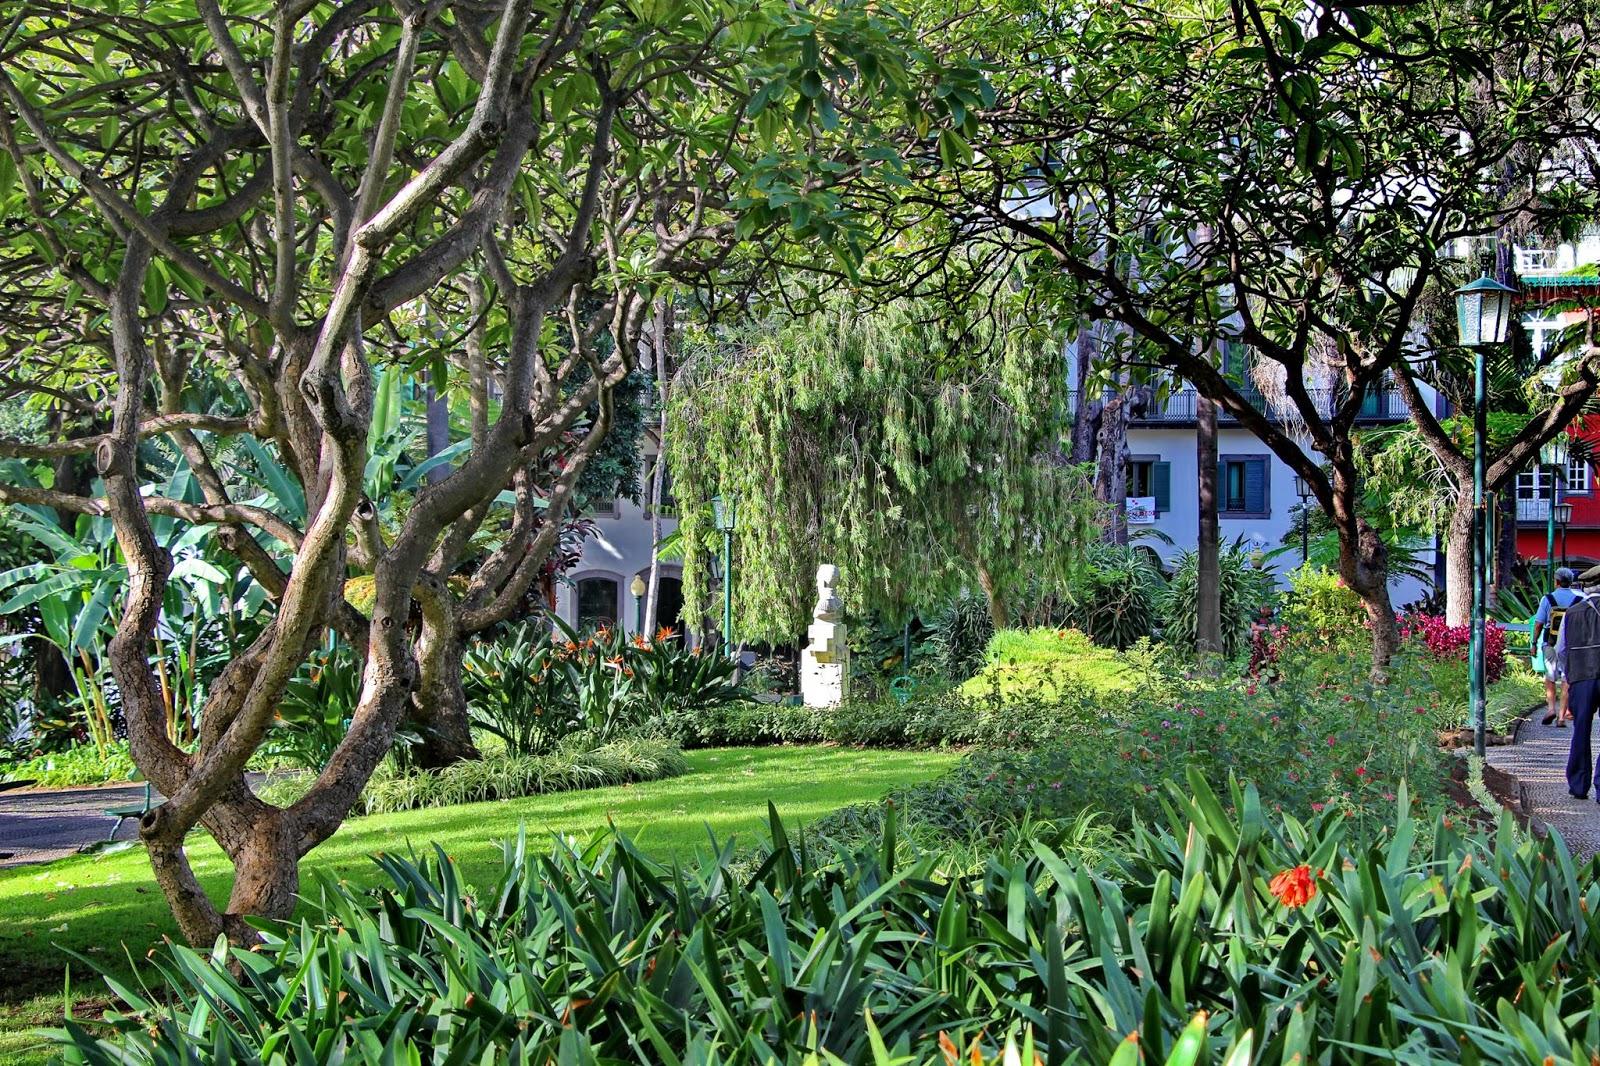 perspetiva diferente do Jardim Municipal